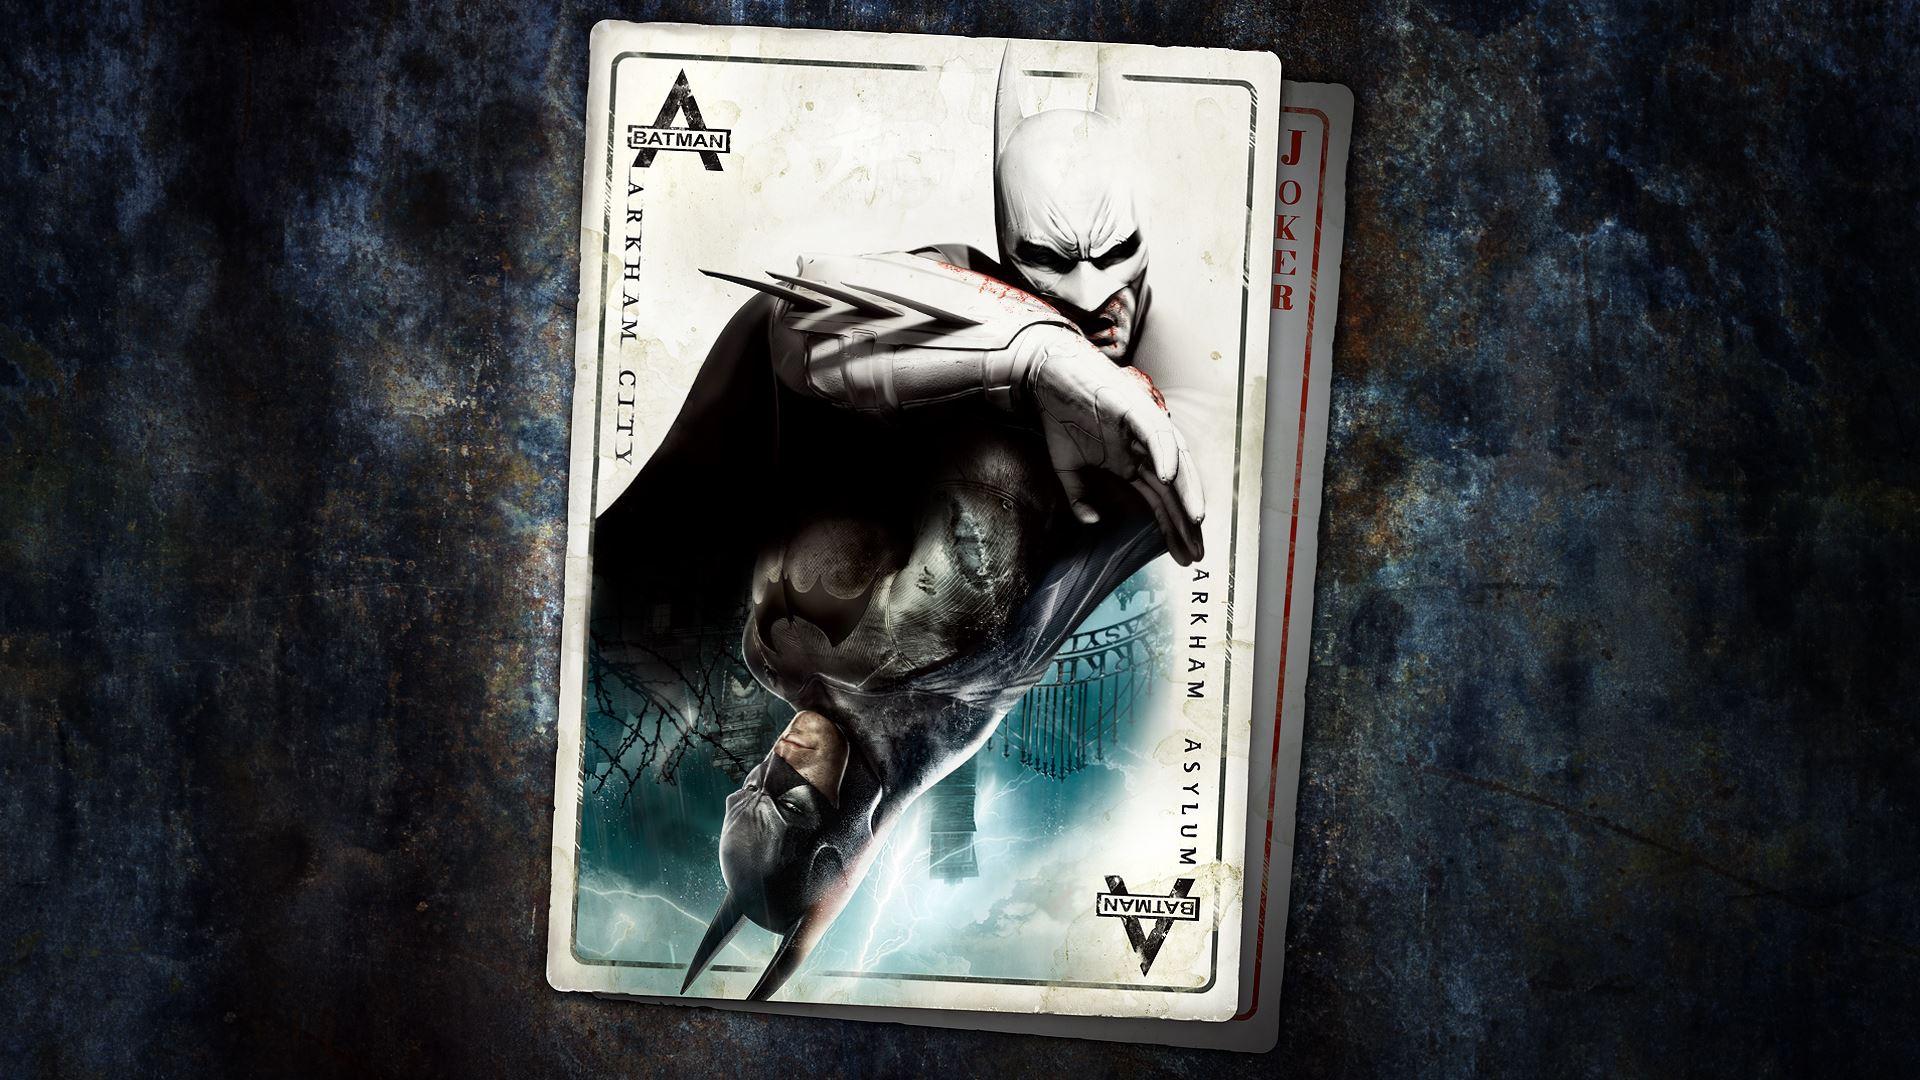 Batman: Return To Arkham بروزرسان پلیاستیشن ۴ پرو را دریافت میکند